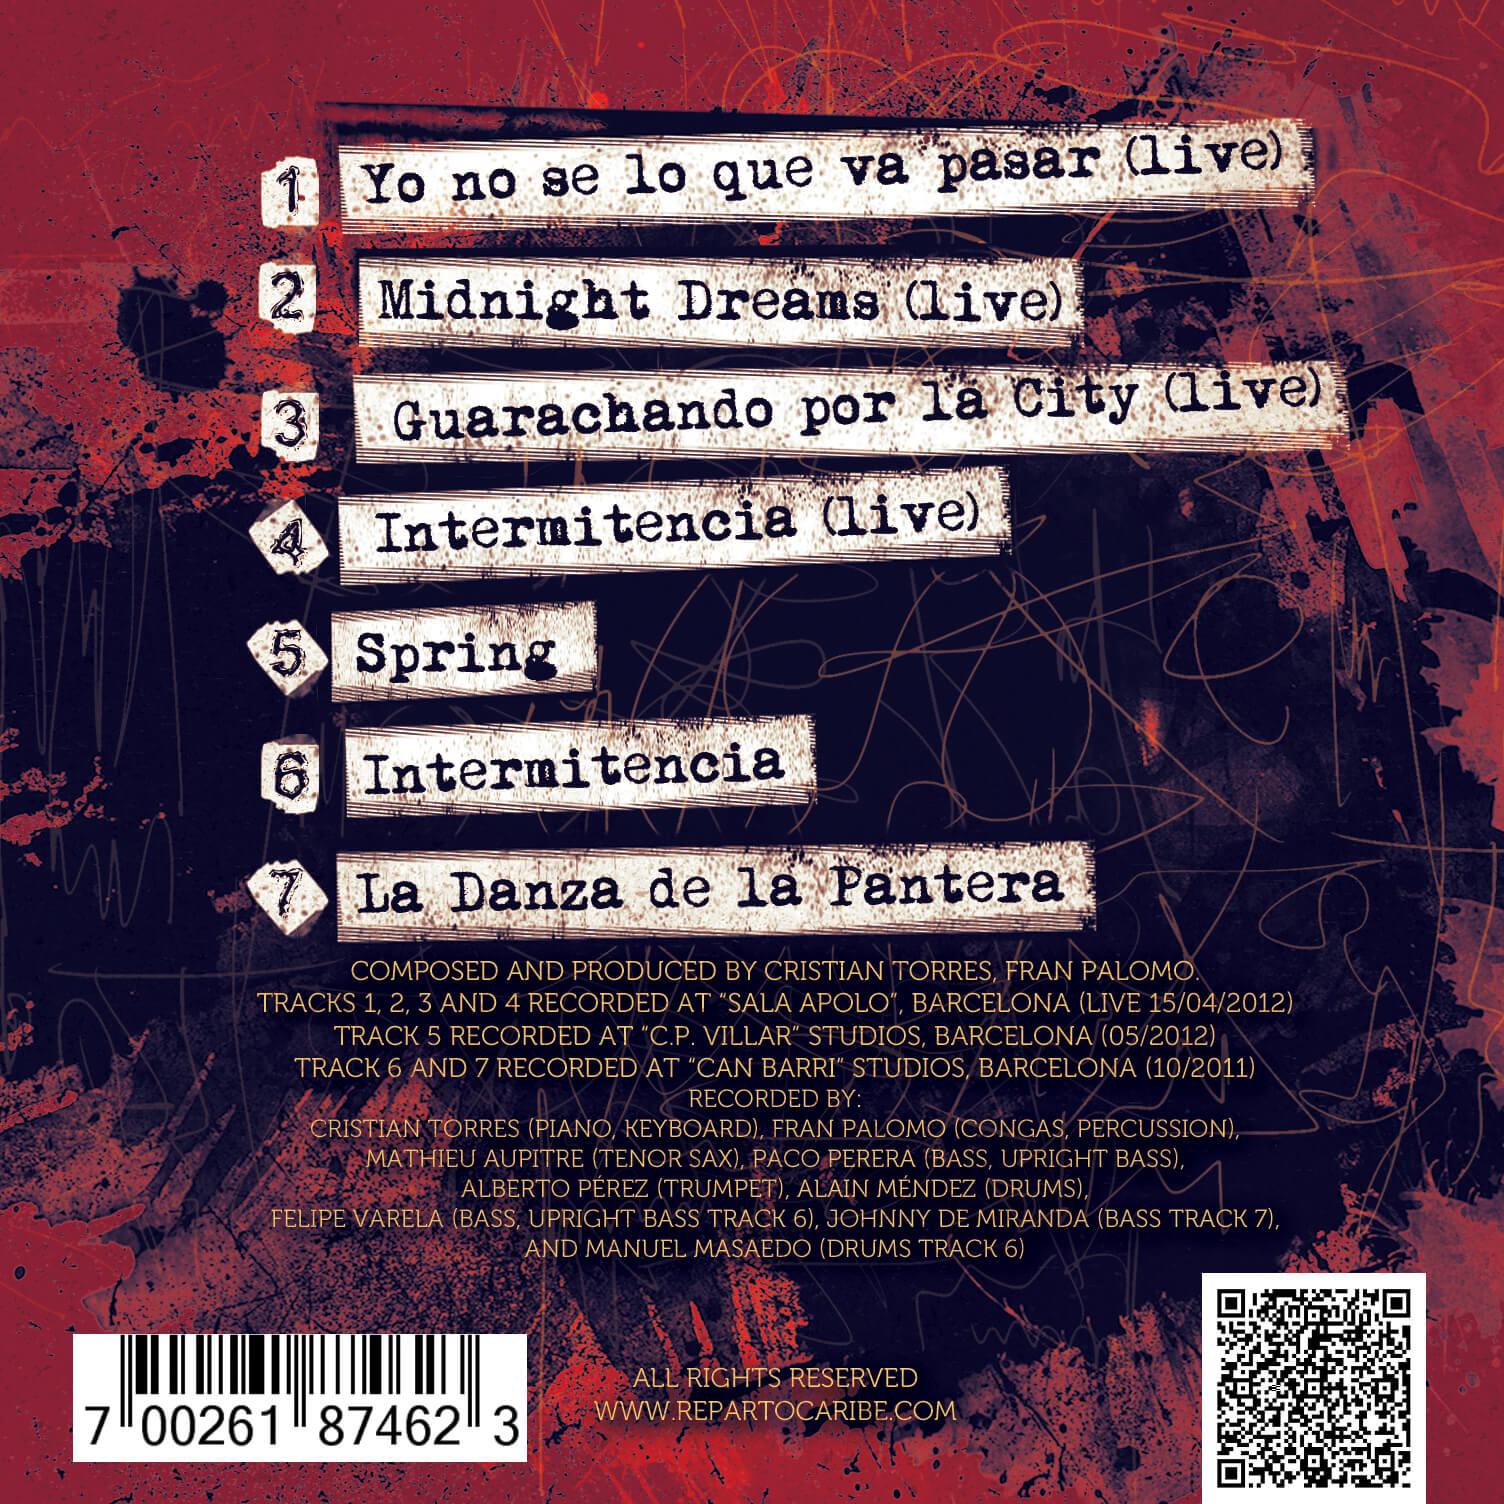 Reparto Caribe Latin Jazz Sextet Tapa disco Alma & Clave. Barcelona